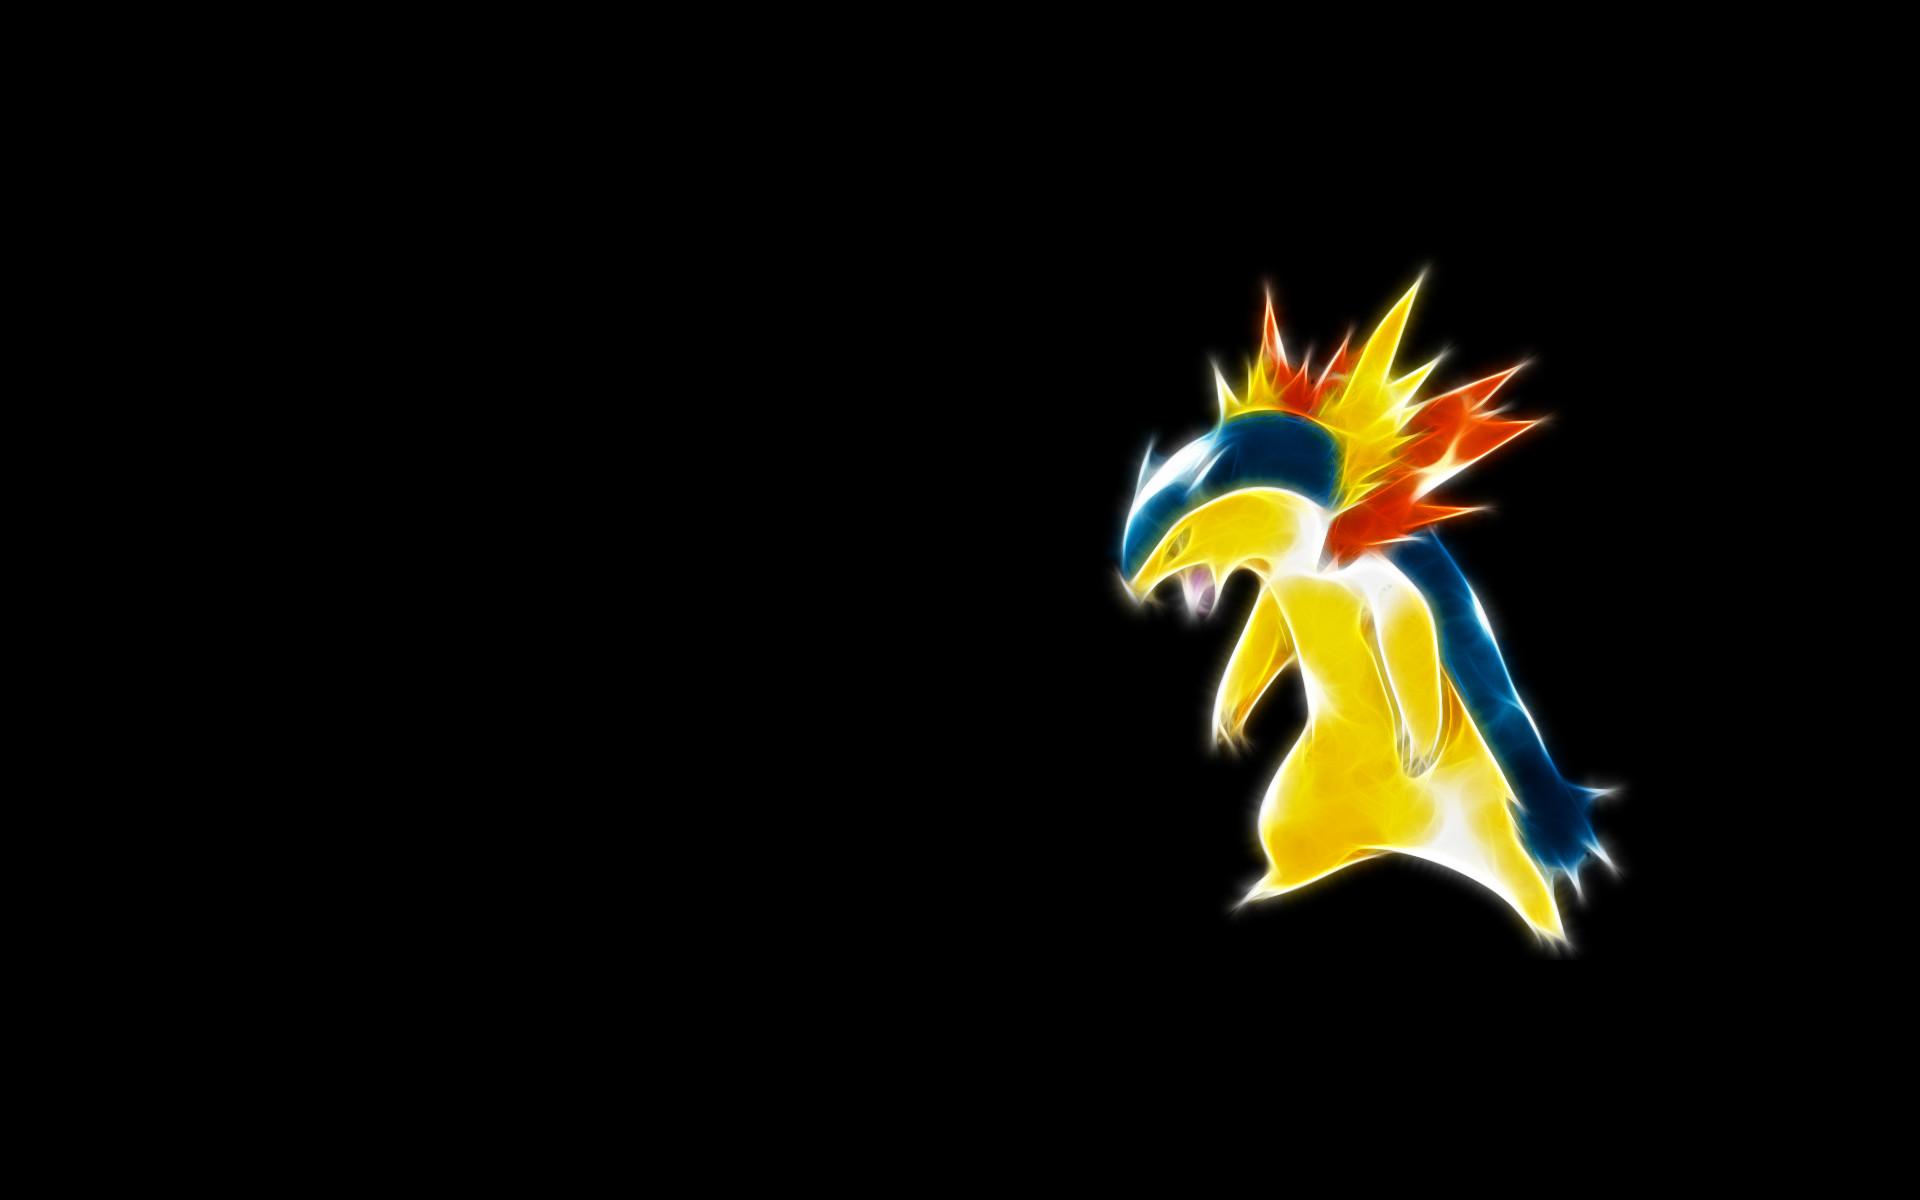 cool pokemon backgrounds | tallteen86, wallpaper, cool, photostream, anime,  pokemon